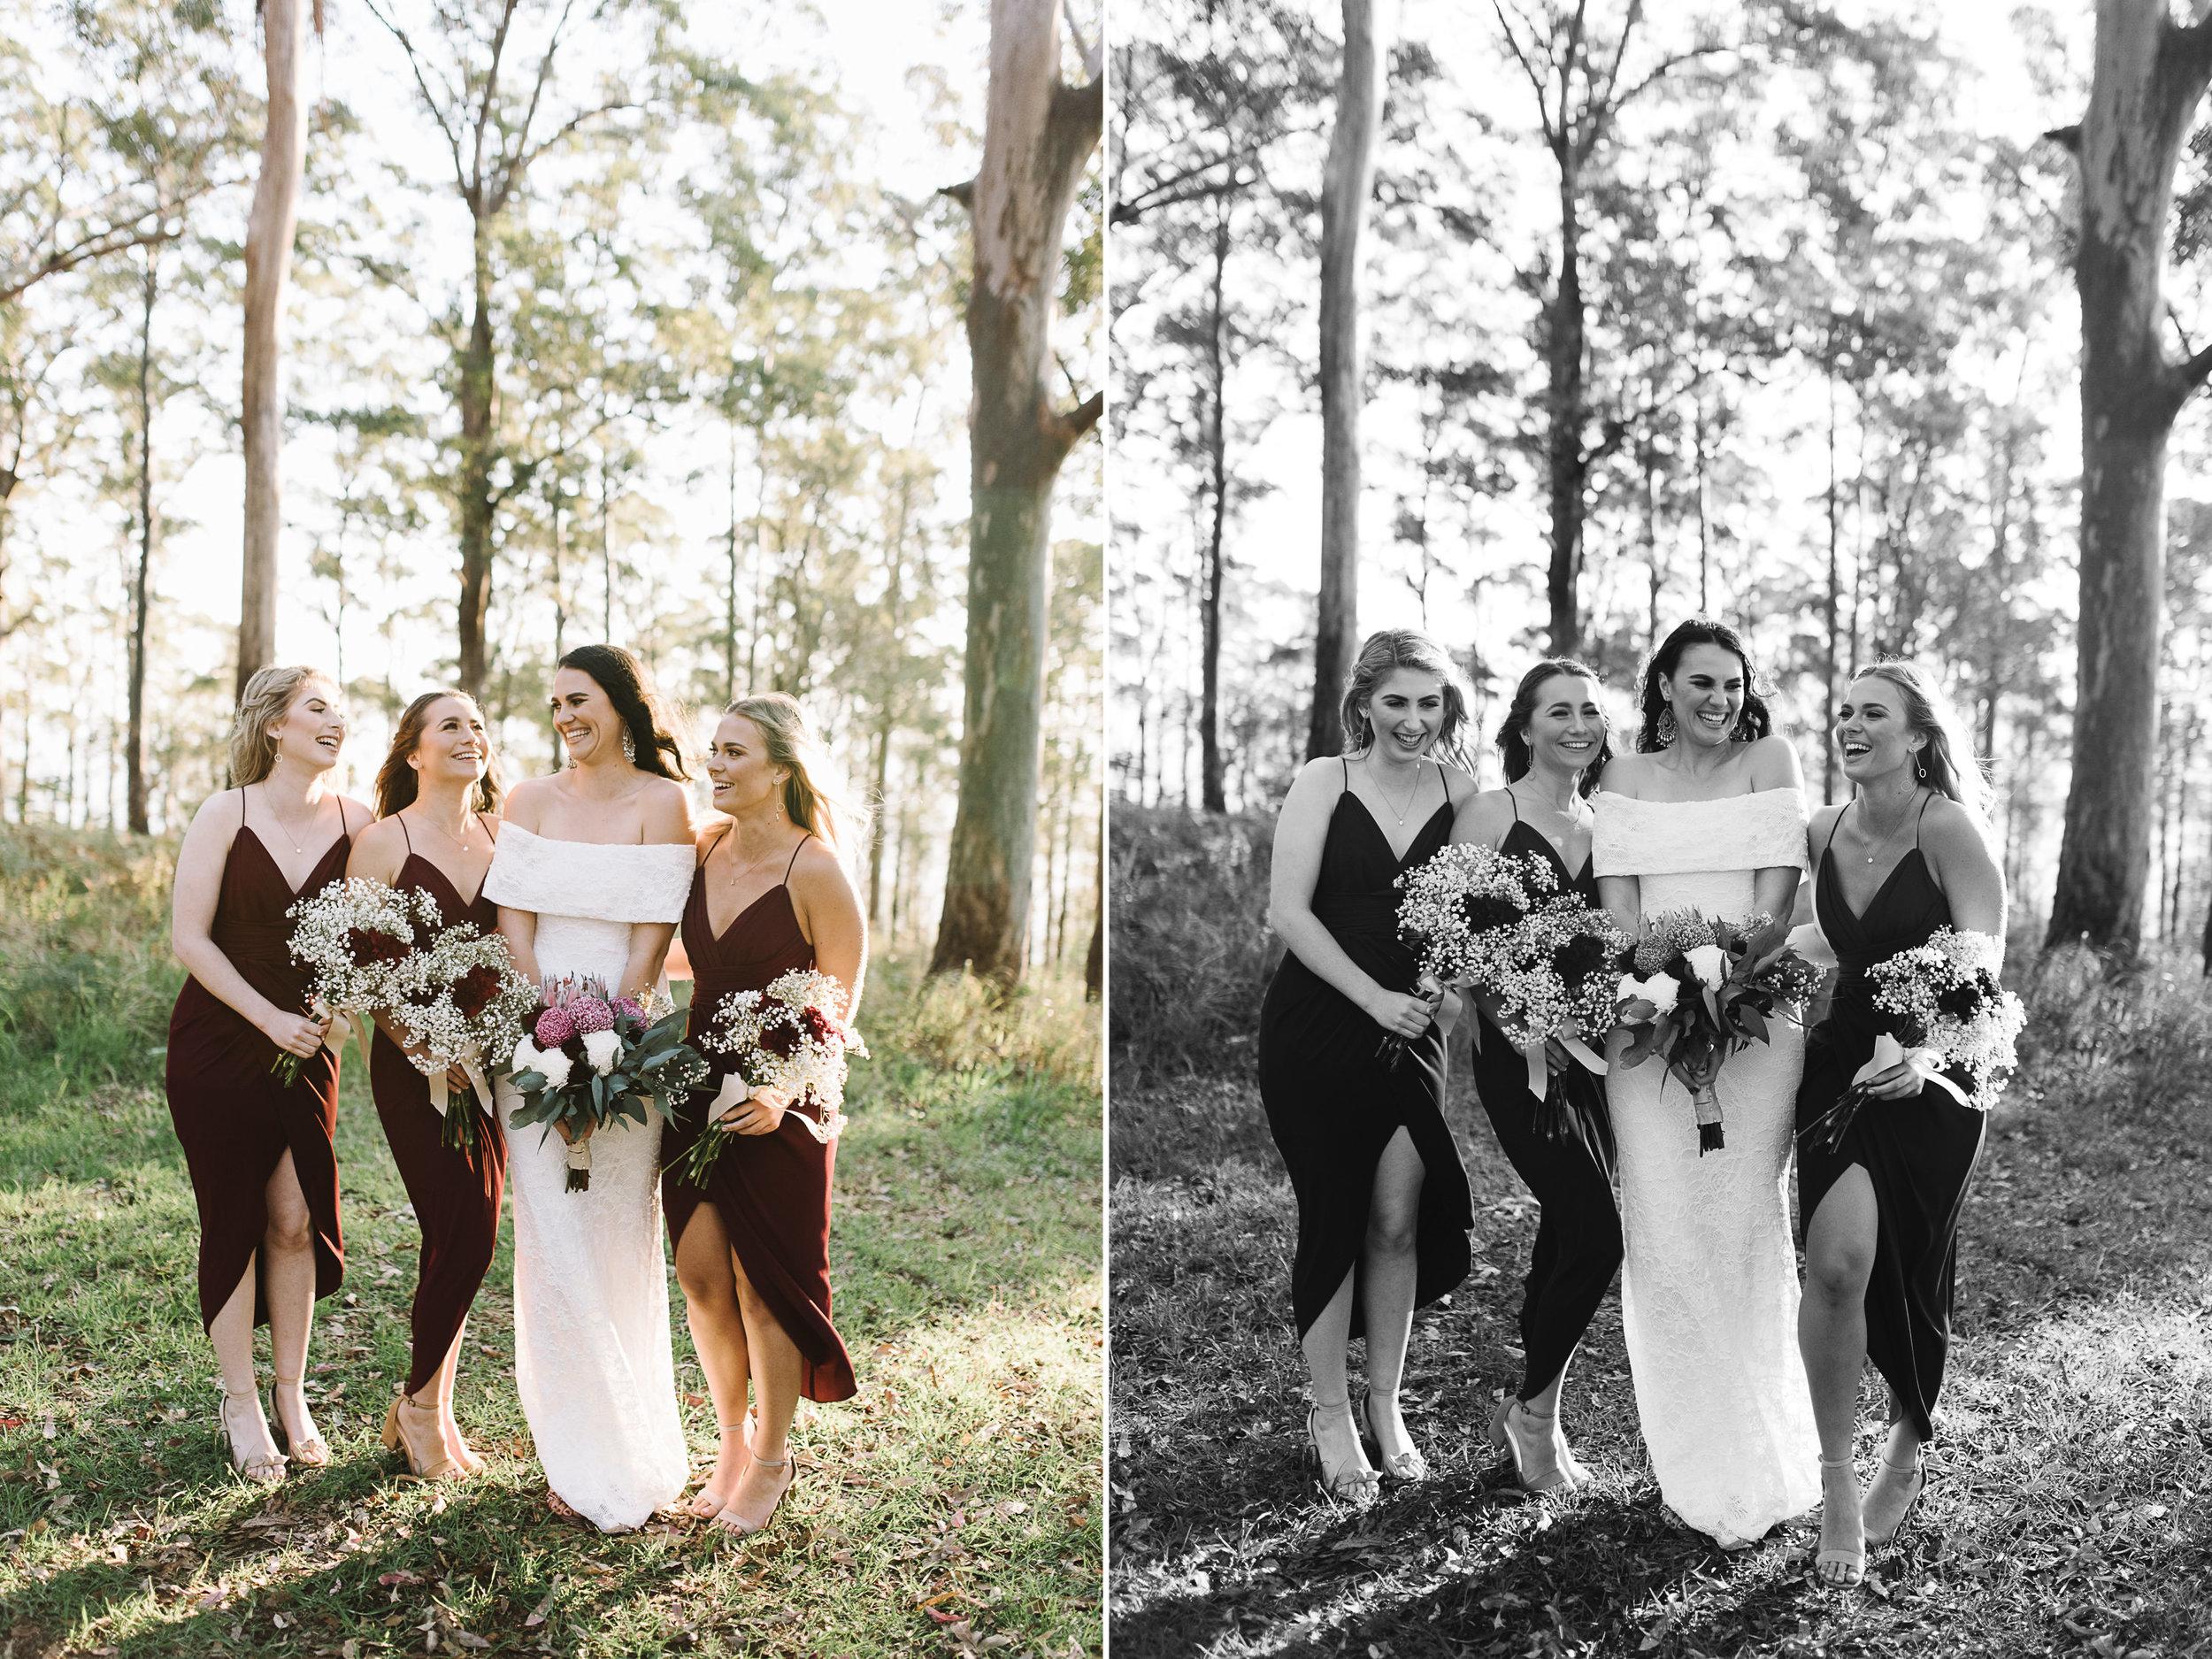 brisbane-gold-coast-sunshine-coast-wedding-photographer-mount-tamborine-wedding-30.jpg